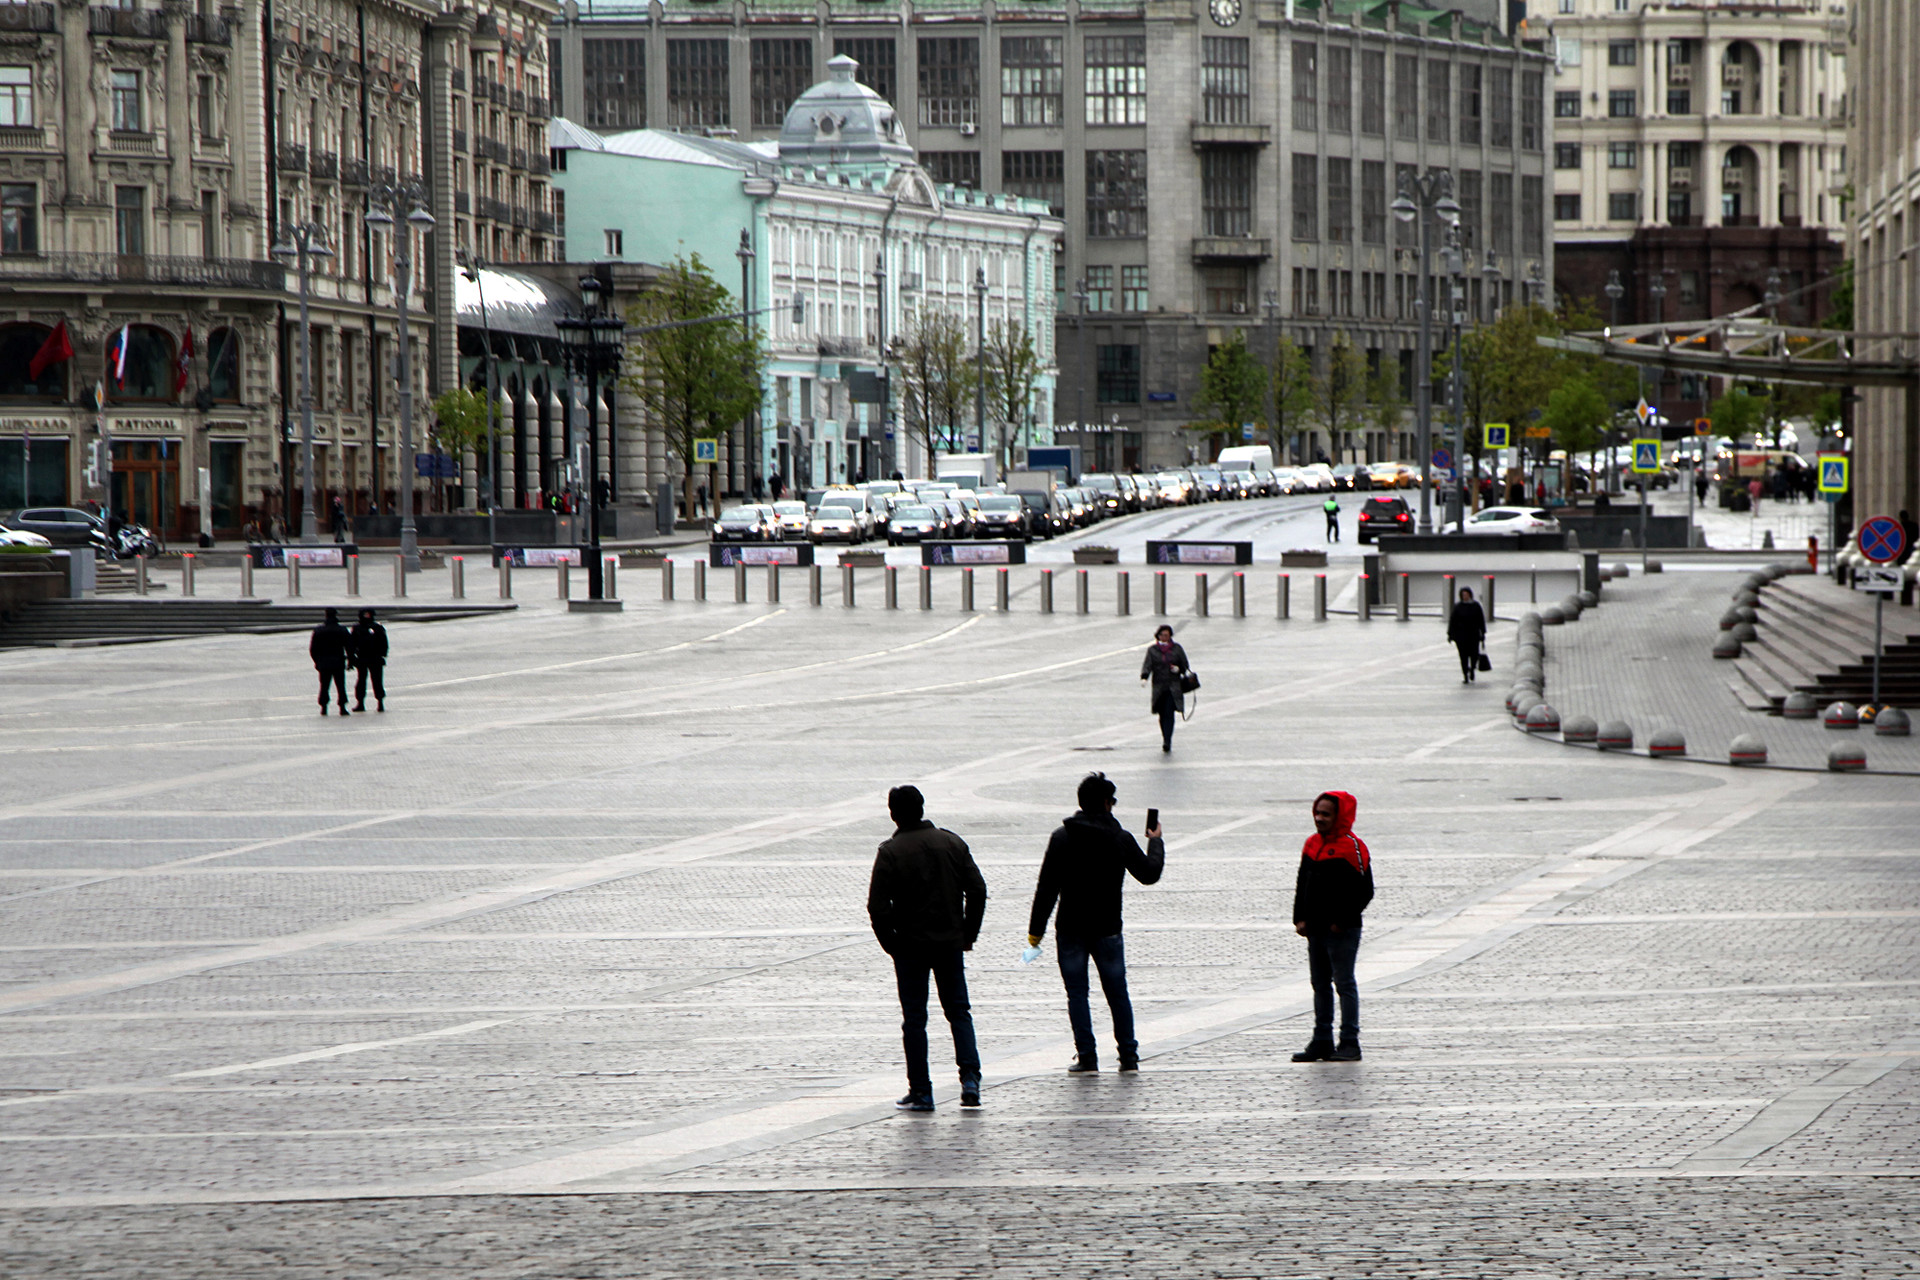 Orang asing mengambil gambar di kawasan Lapangan Manezhnaya, sementara di belakang mereka terlihat jejeran kendaraan di Tverskaya Ulitsa.